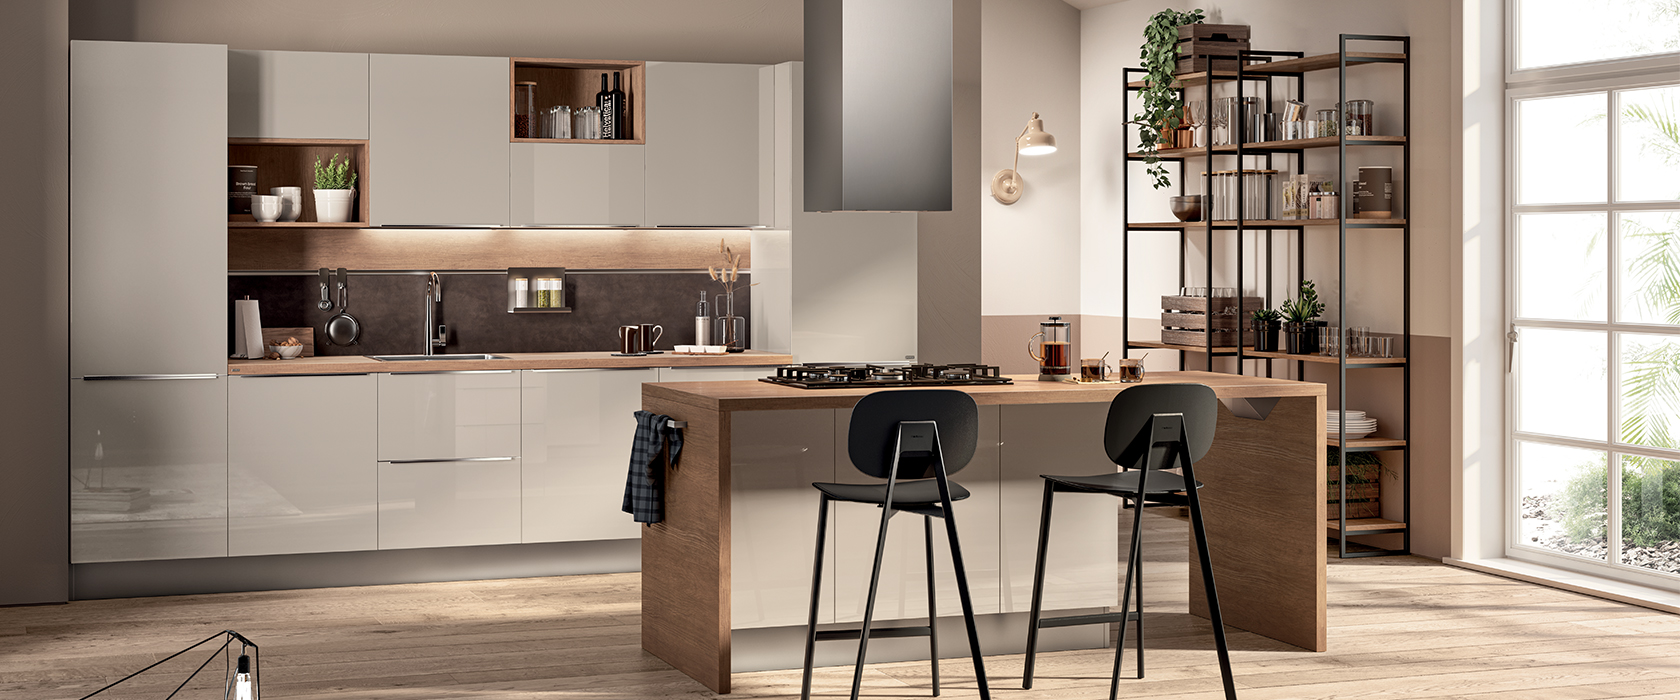 12657_cucina-Urban-Scavolini-Easy-01